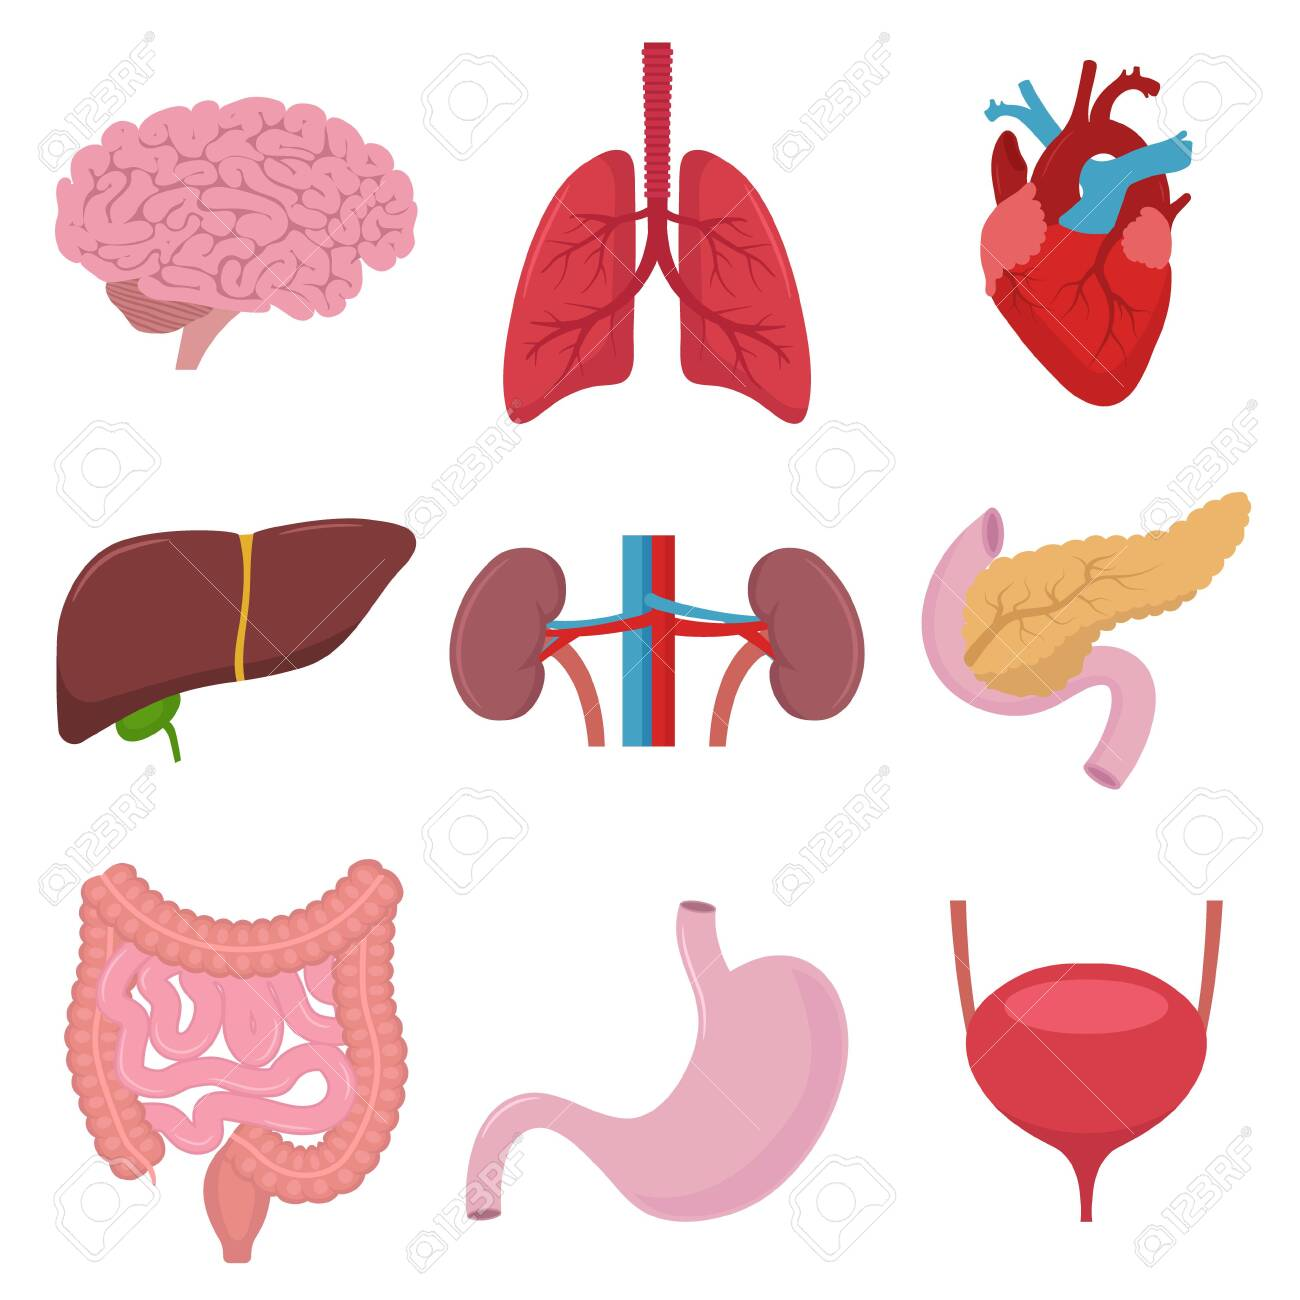 Vector illstration of human organs icon. Flat design. - 139676052